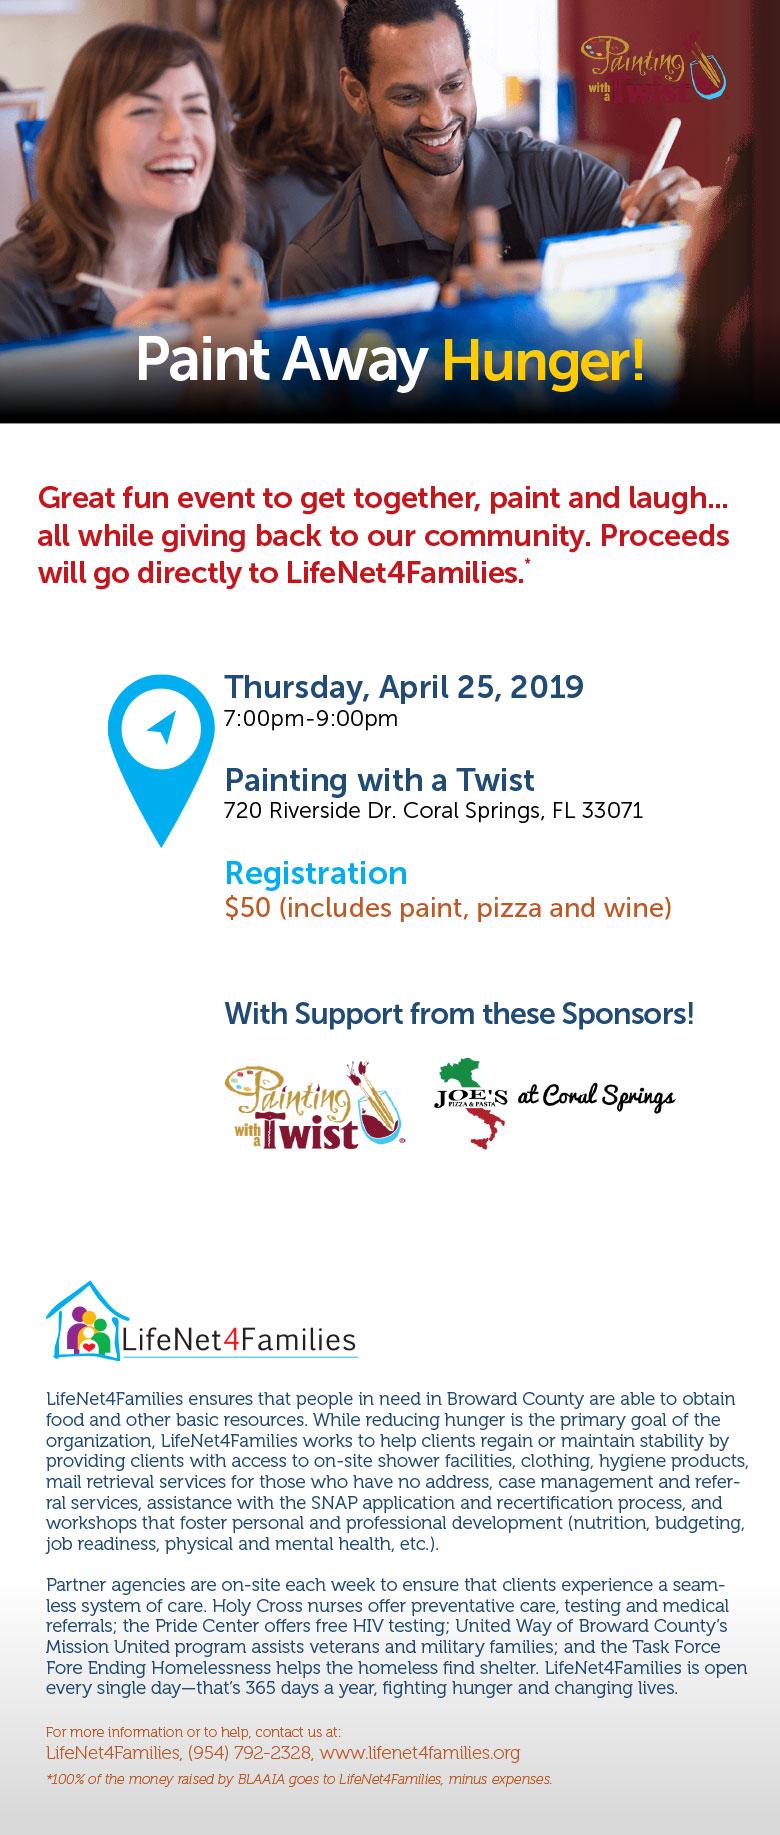 2019 paint hunger away event